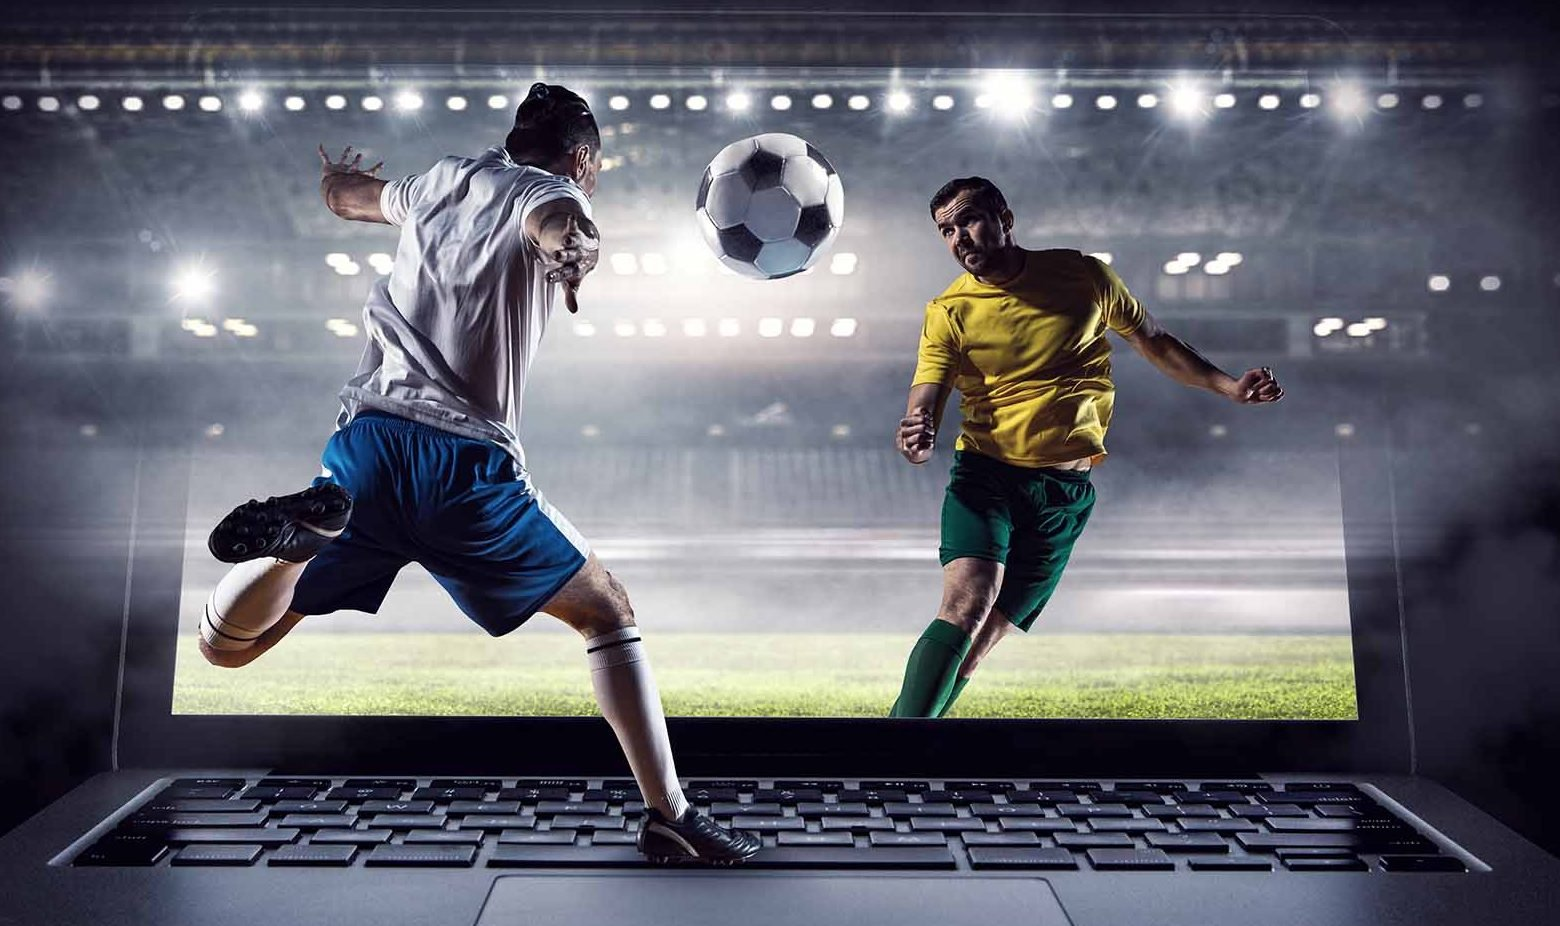 Футбол чемпионата испании турнирная таблица по футболу 2020